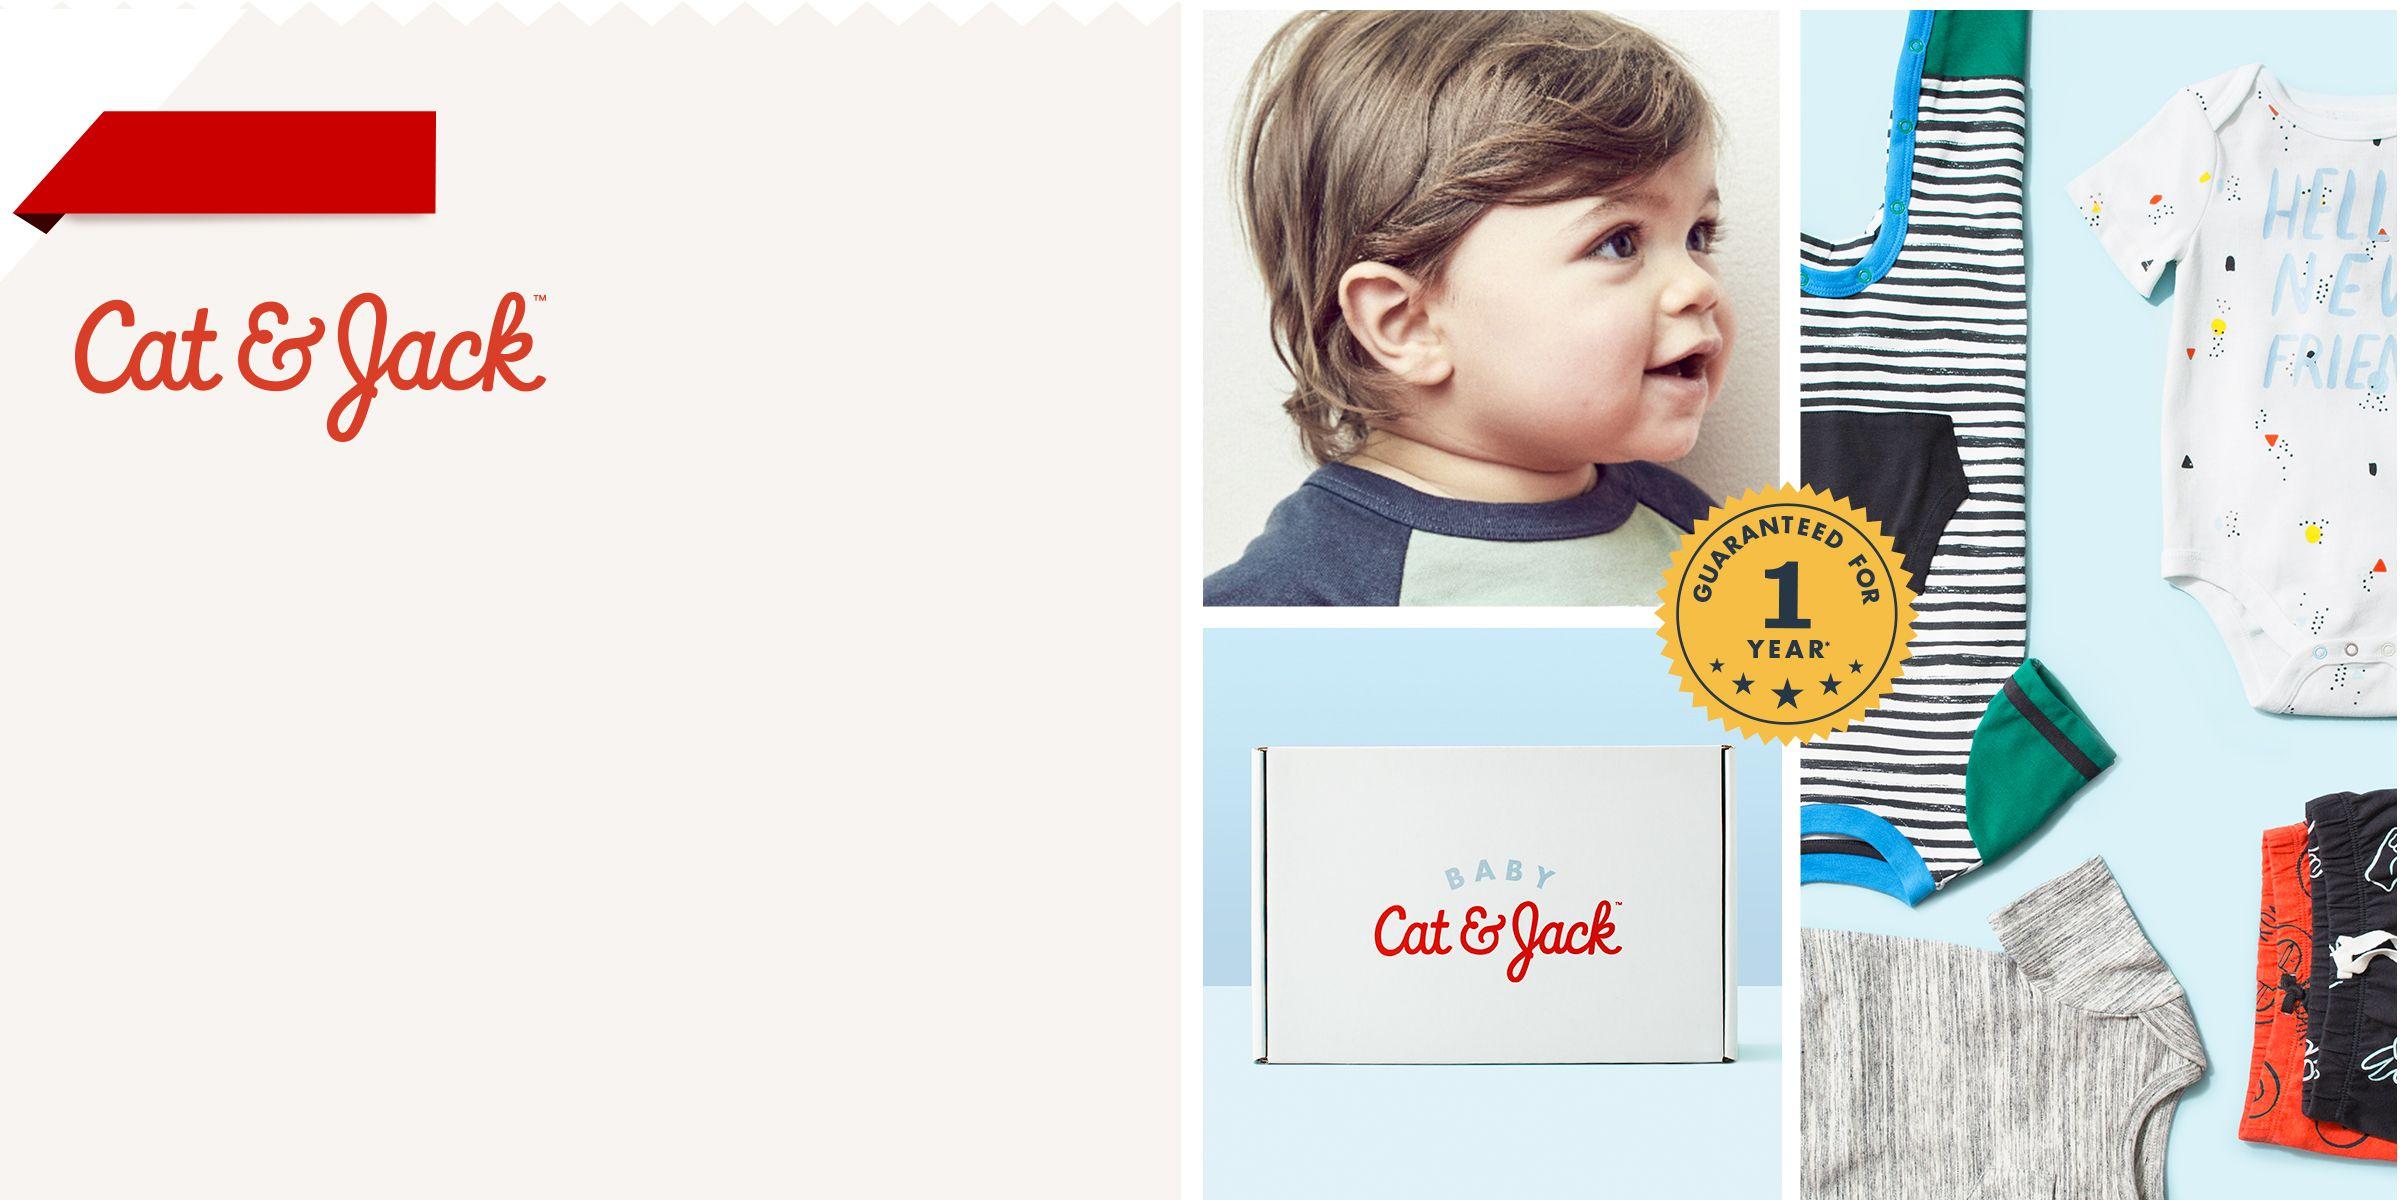 Target's Cat & Jack Ba...